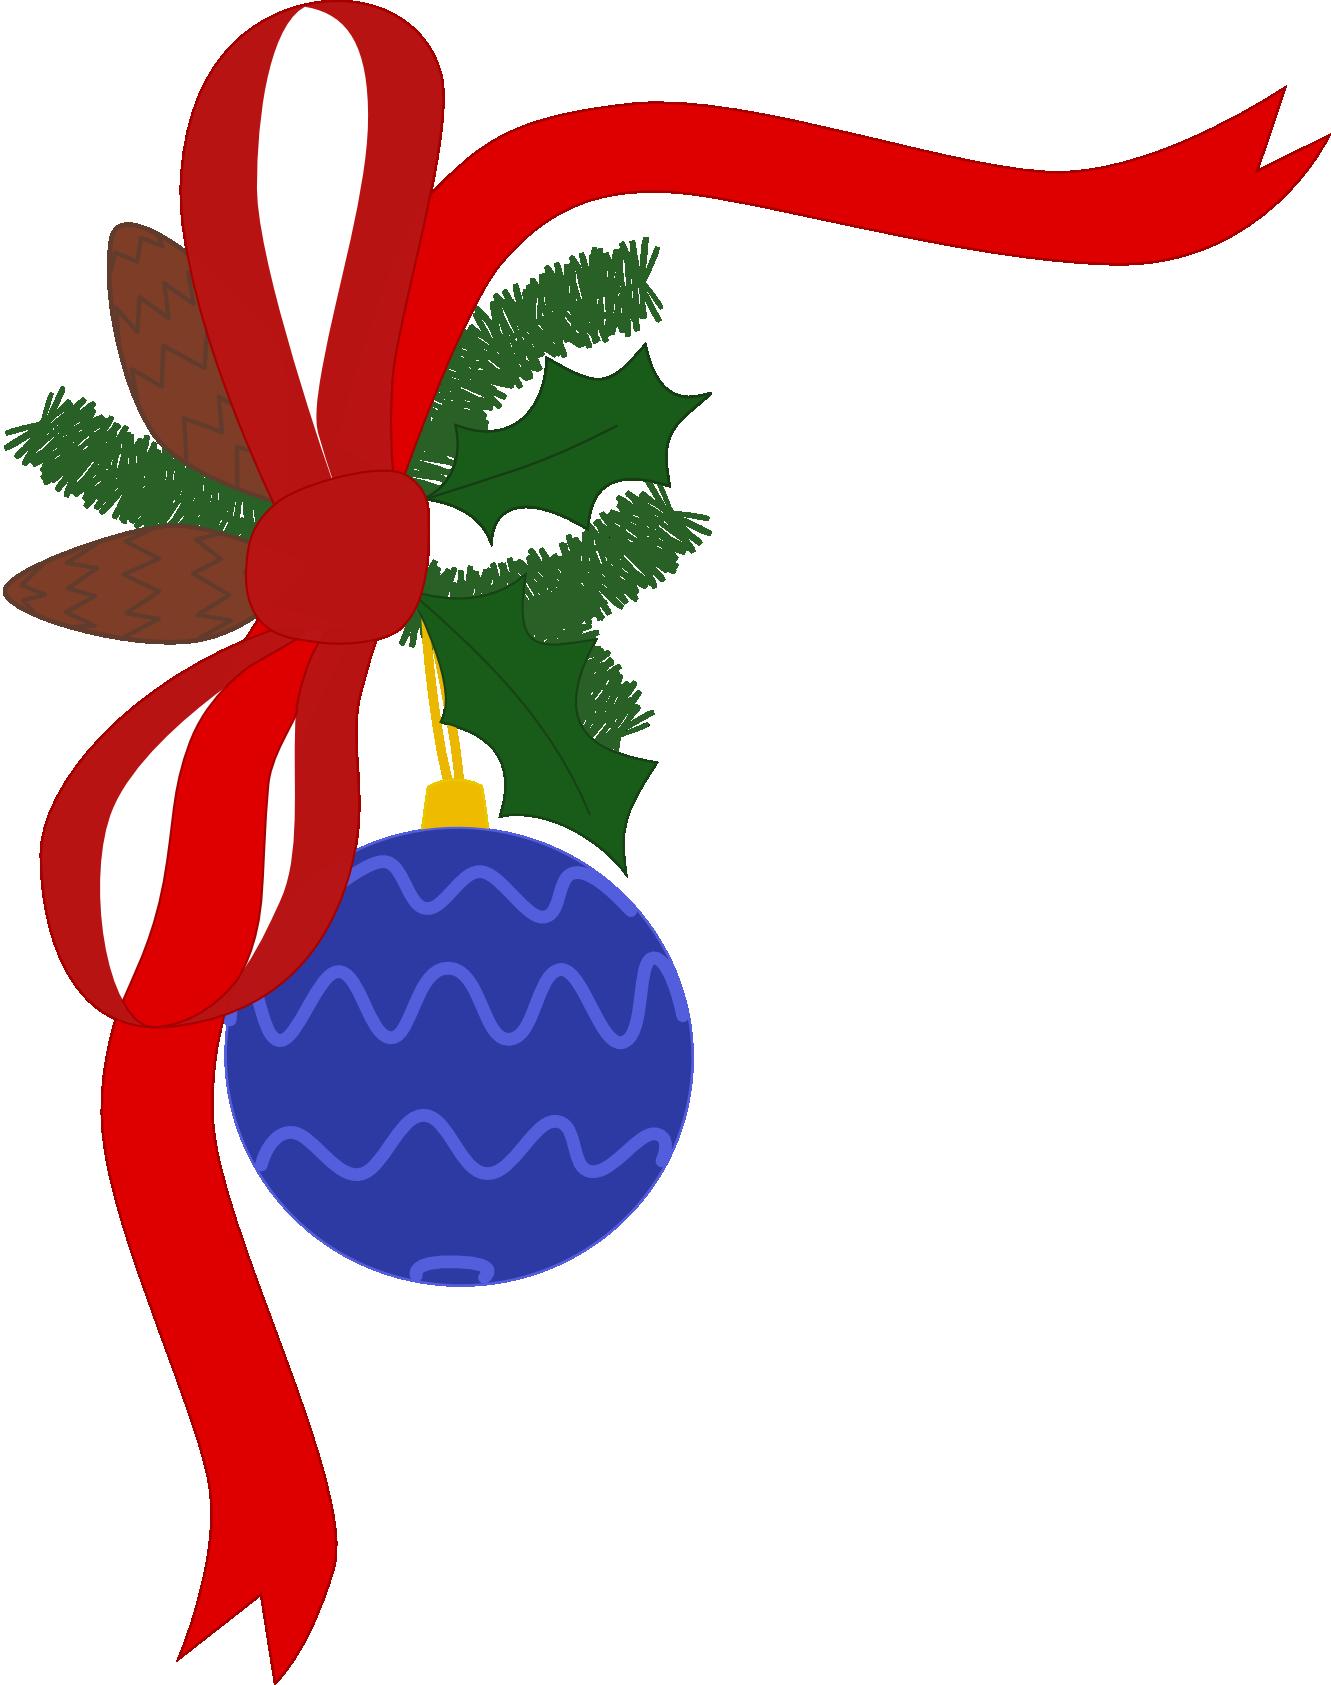 Clip art pictures christmas decorations clipground christmas decorations clip art biocorpaavc